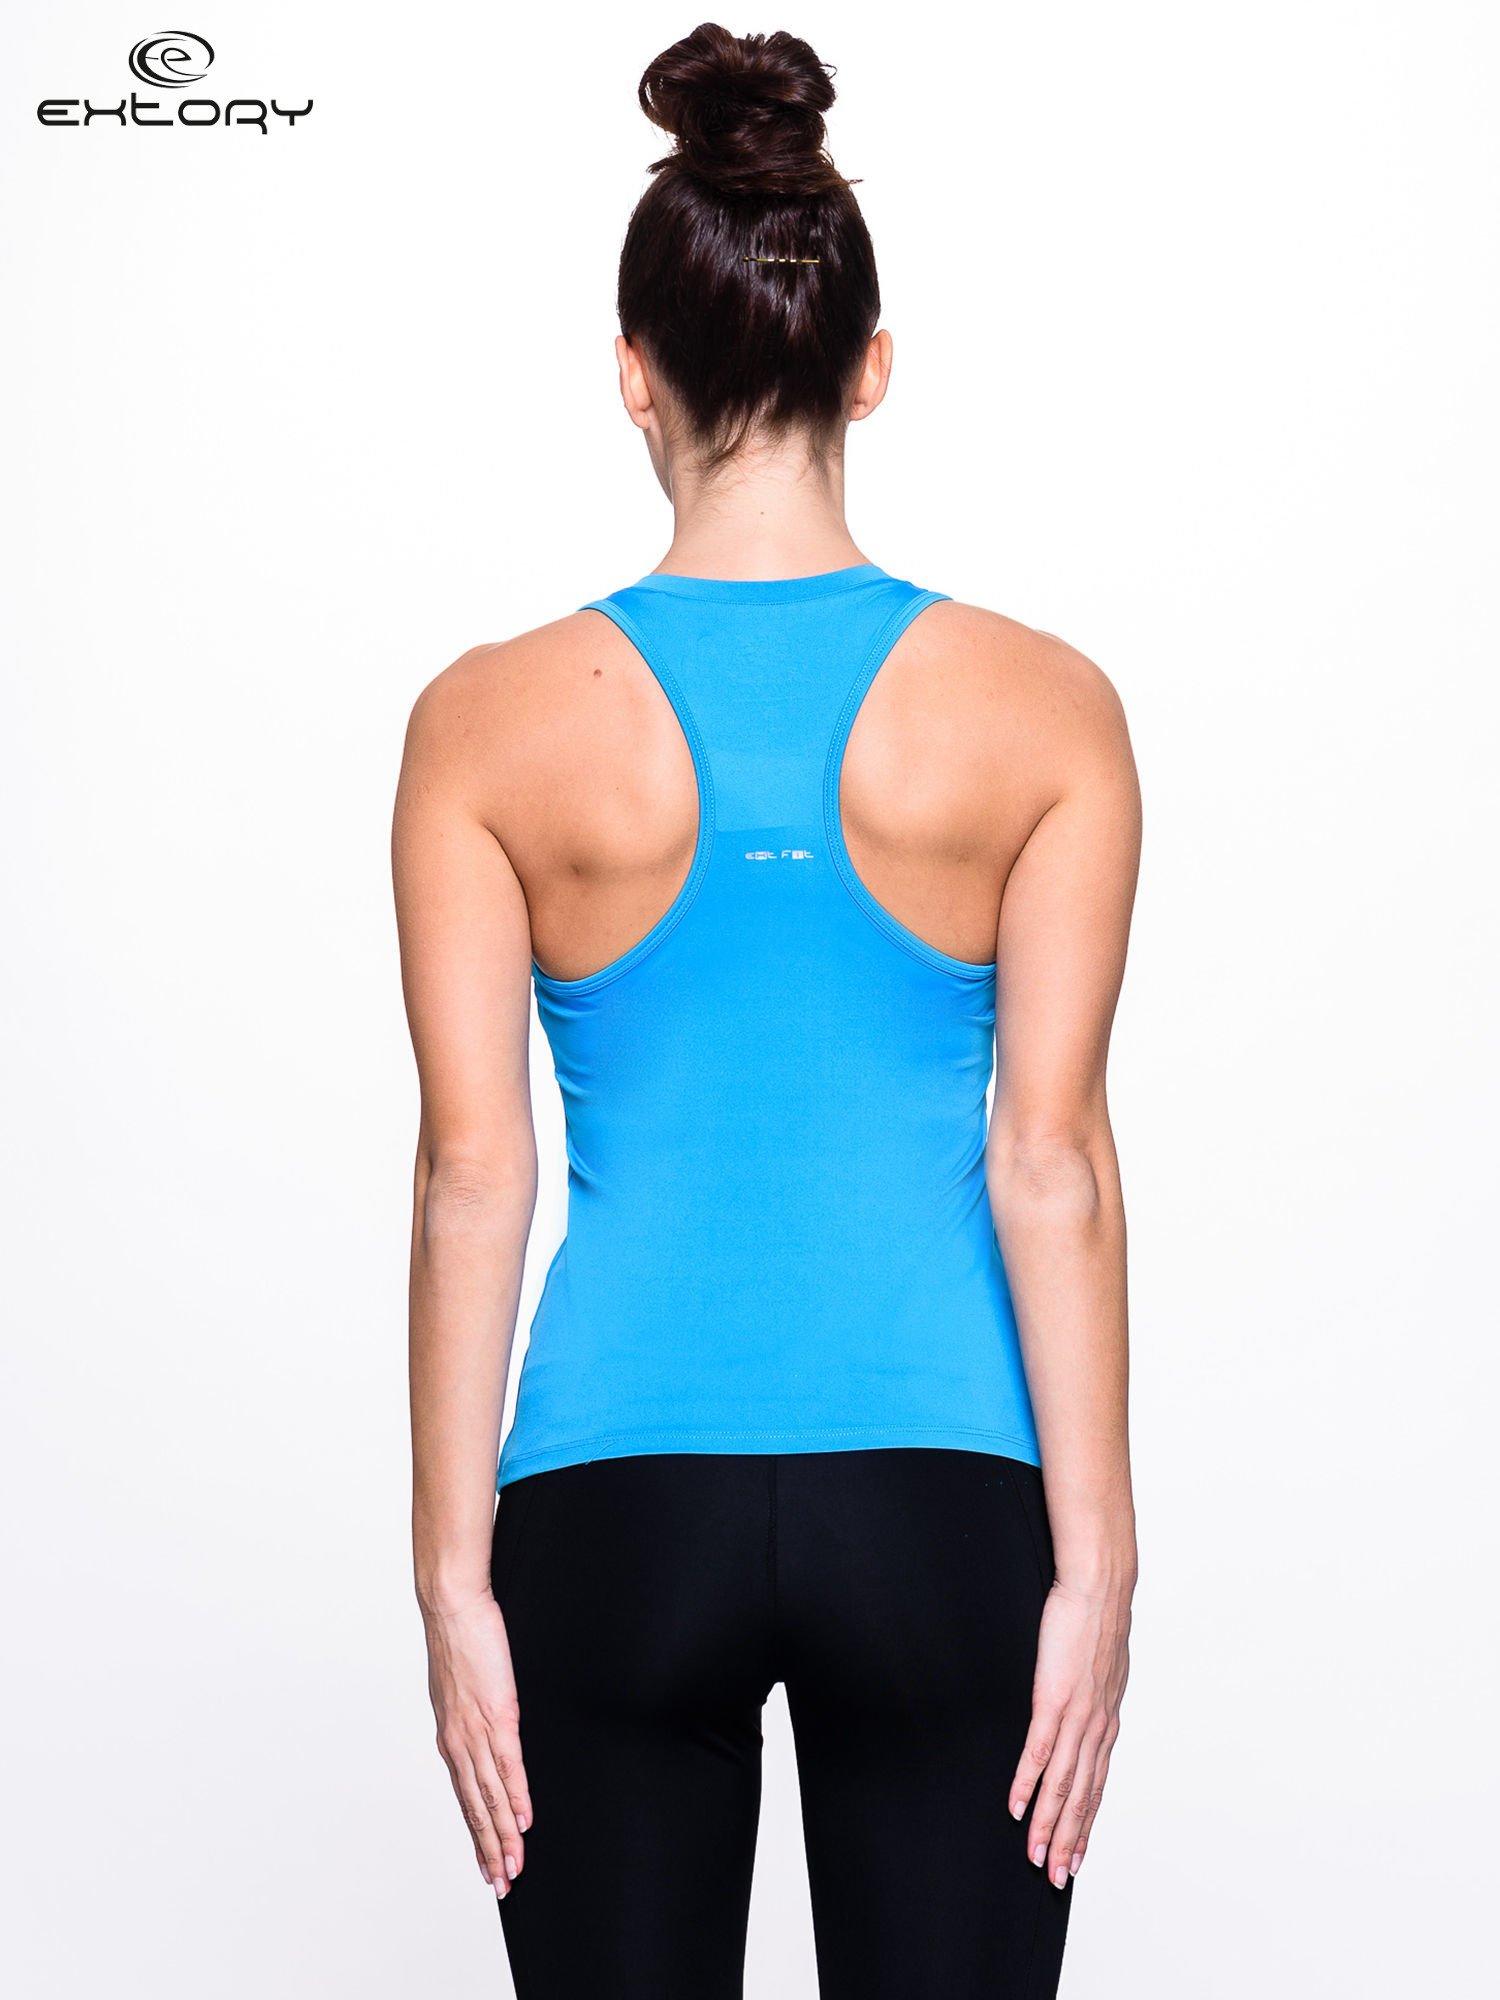 Niebieski top fitness z dekoltem V                                  zdj.                                  4